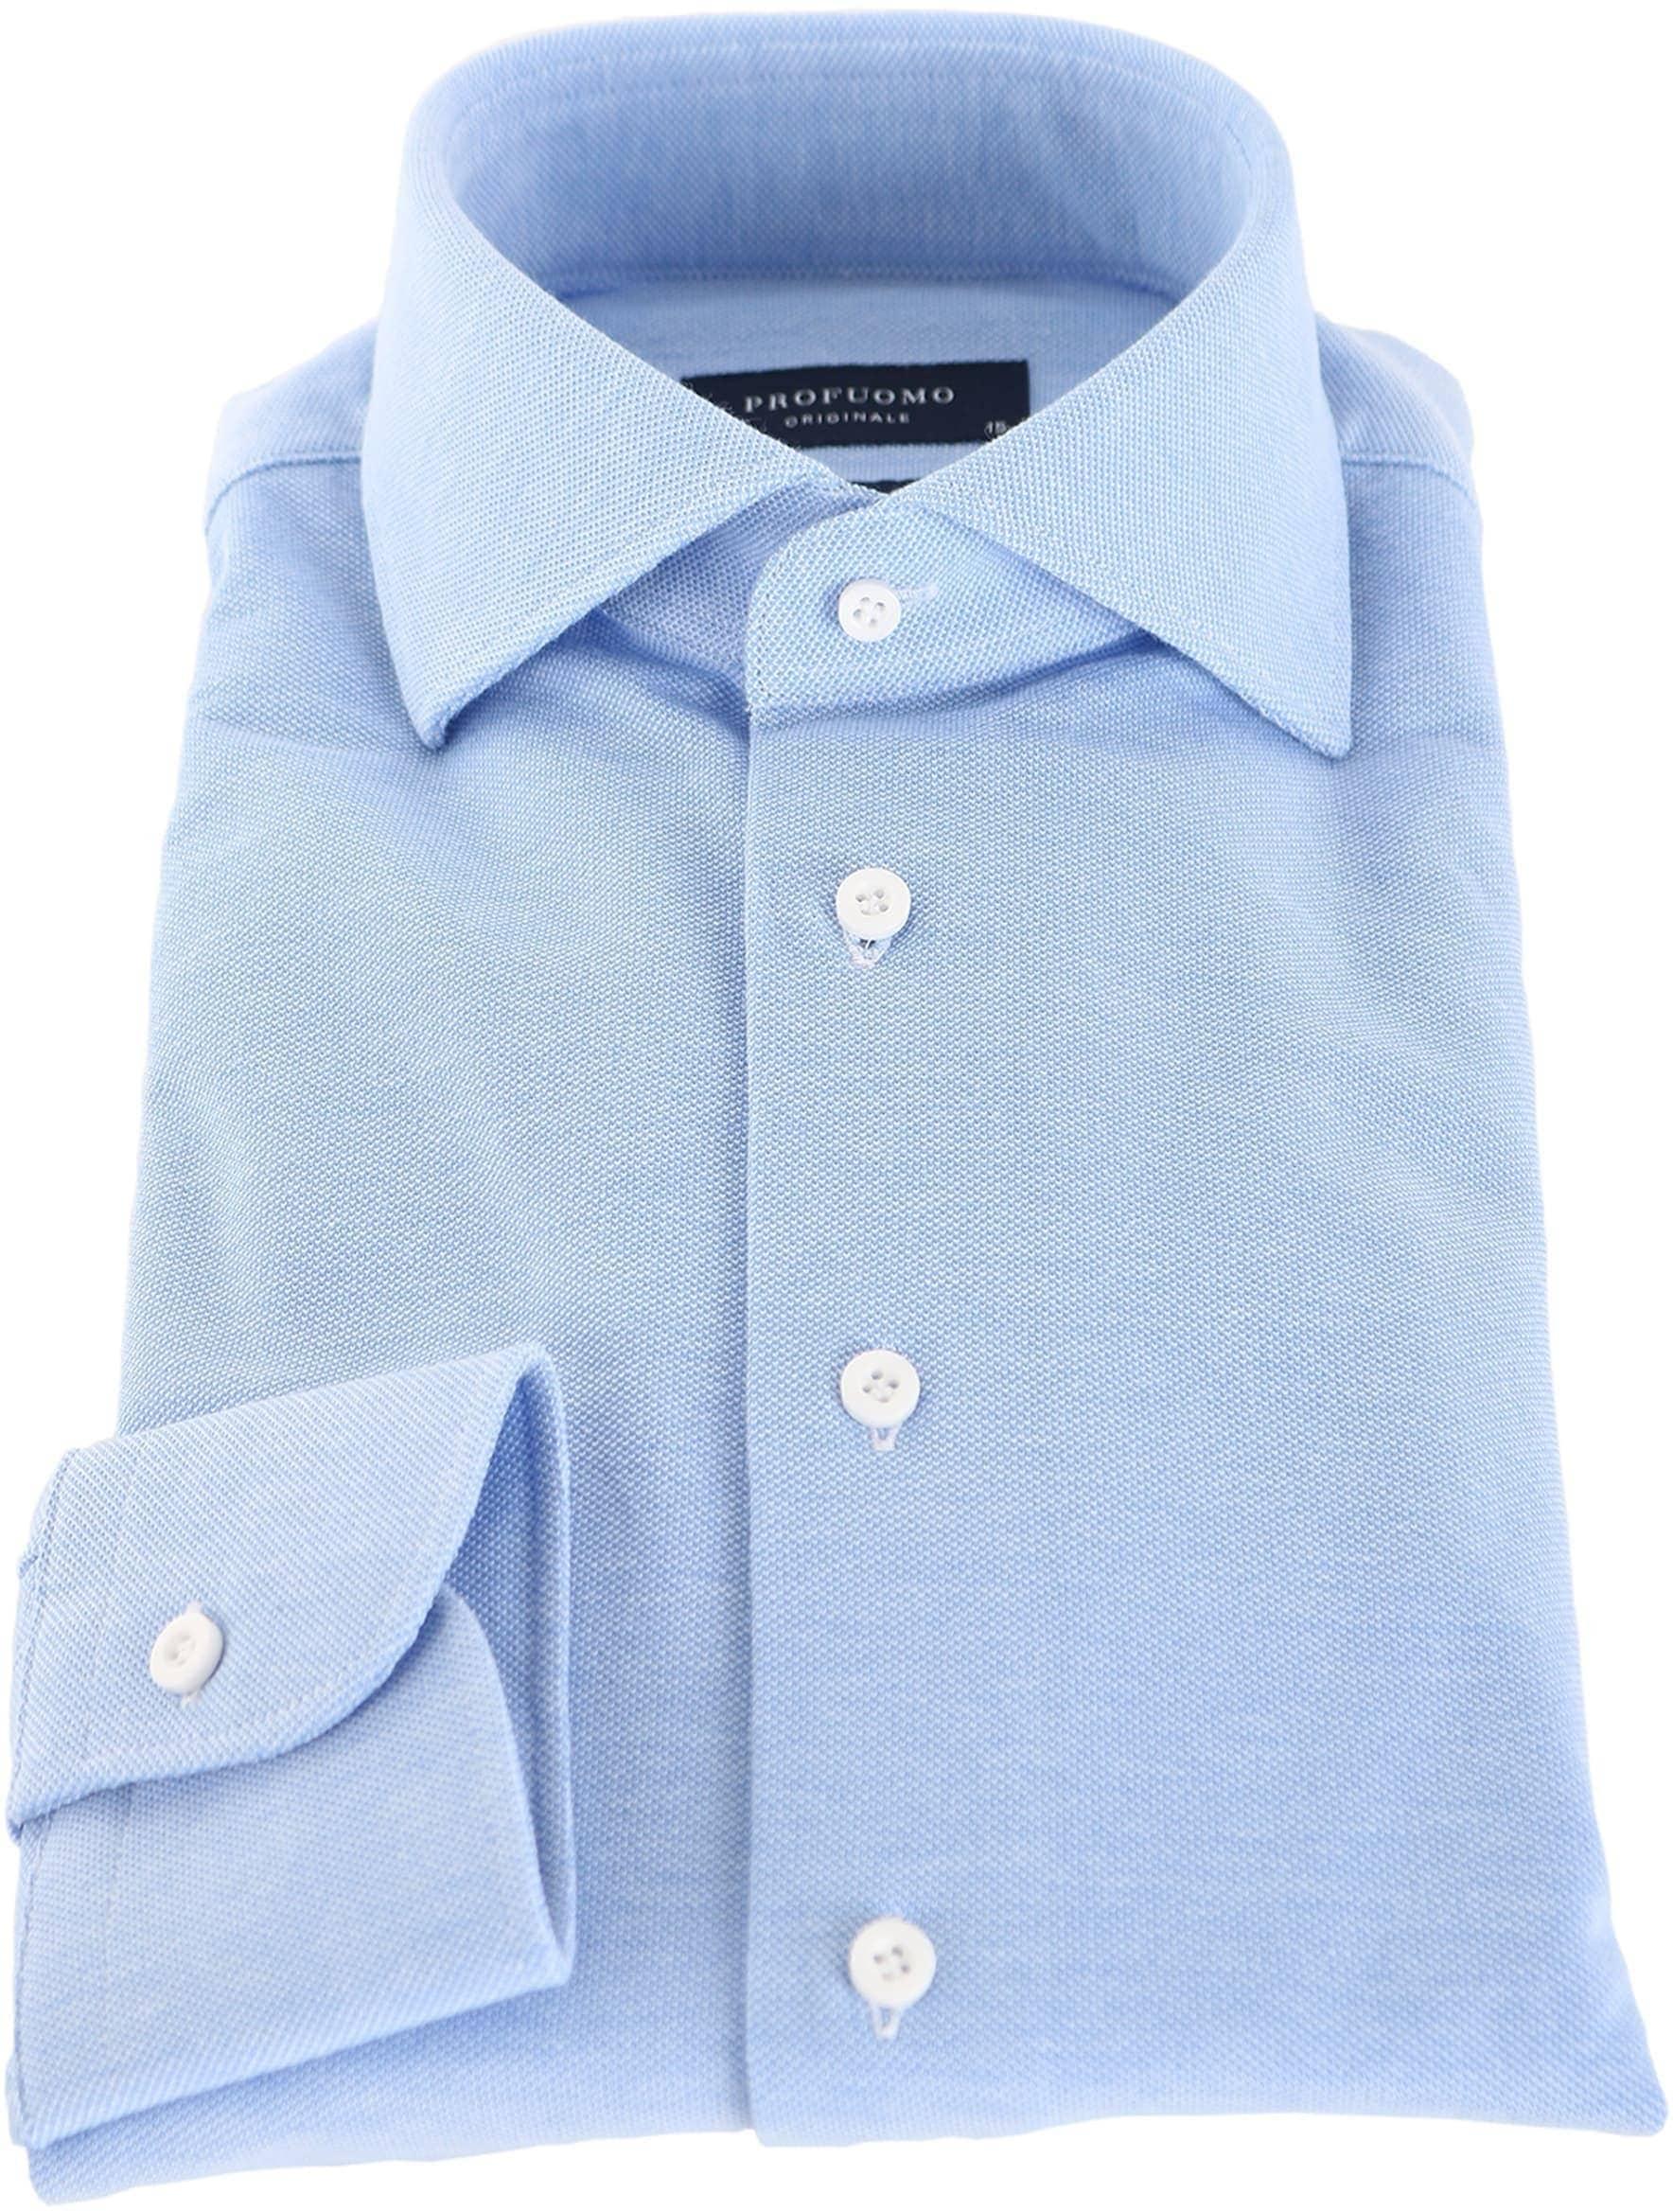 Profuomo Overhemd Knitted Blauw foto 1